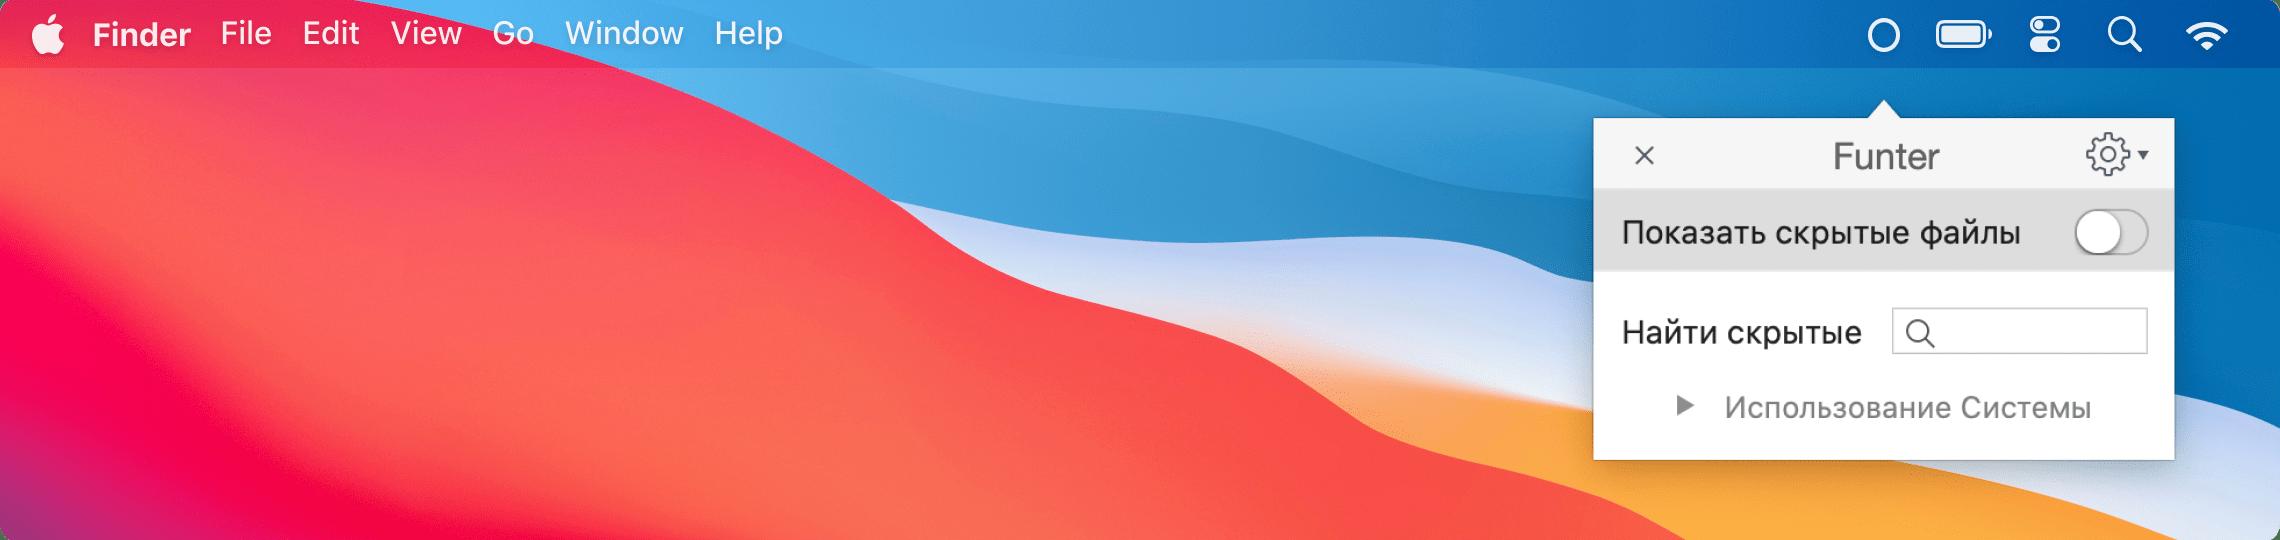 Funter popup menu on a Mac desktop